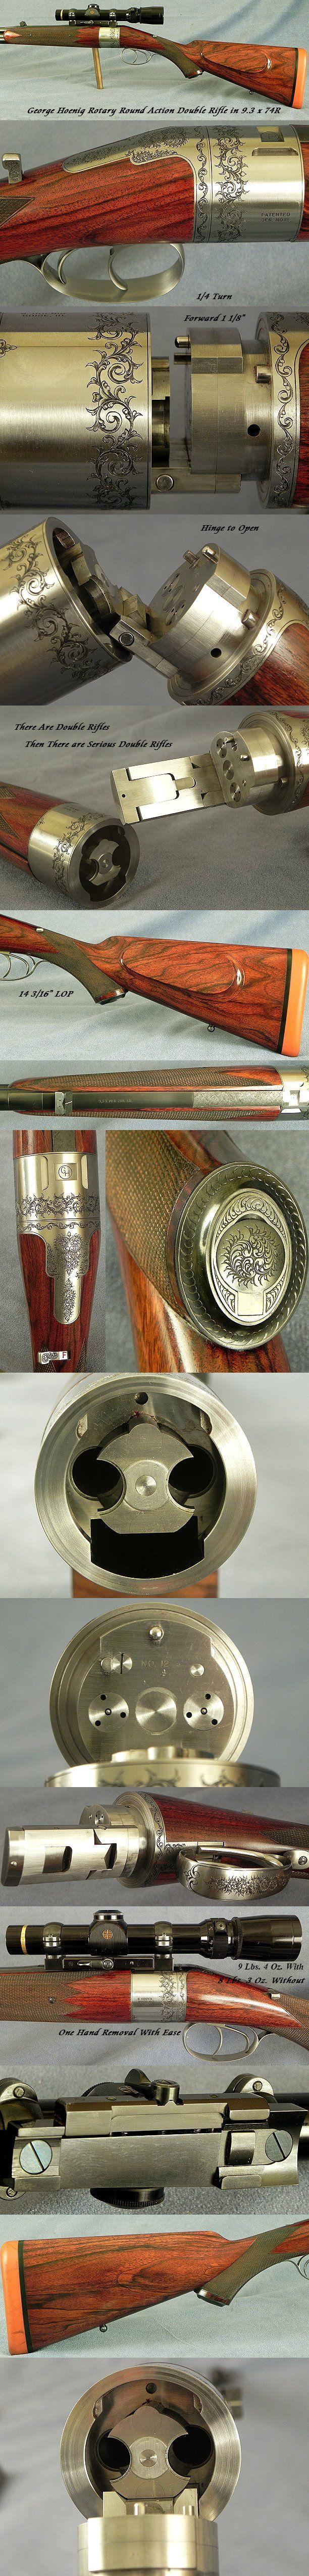 OMG. . . . . .George Hoenig Rotary Round Action - Beretta 1935 Wood Grips http://www.rgrips.com/en/beretta-1934-1935-grips/15-beretta-19341935-grips.html